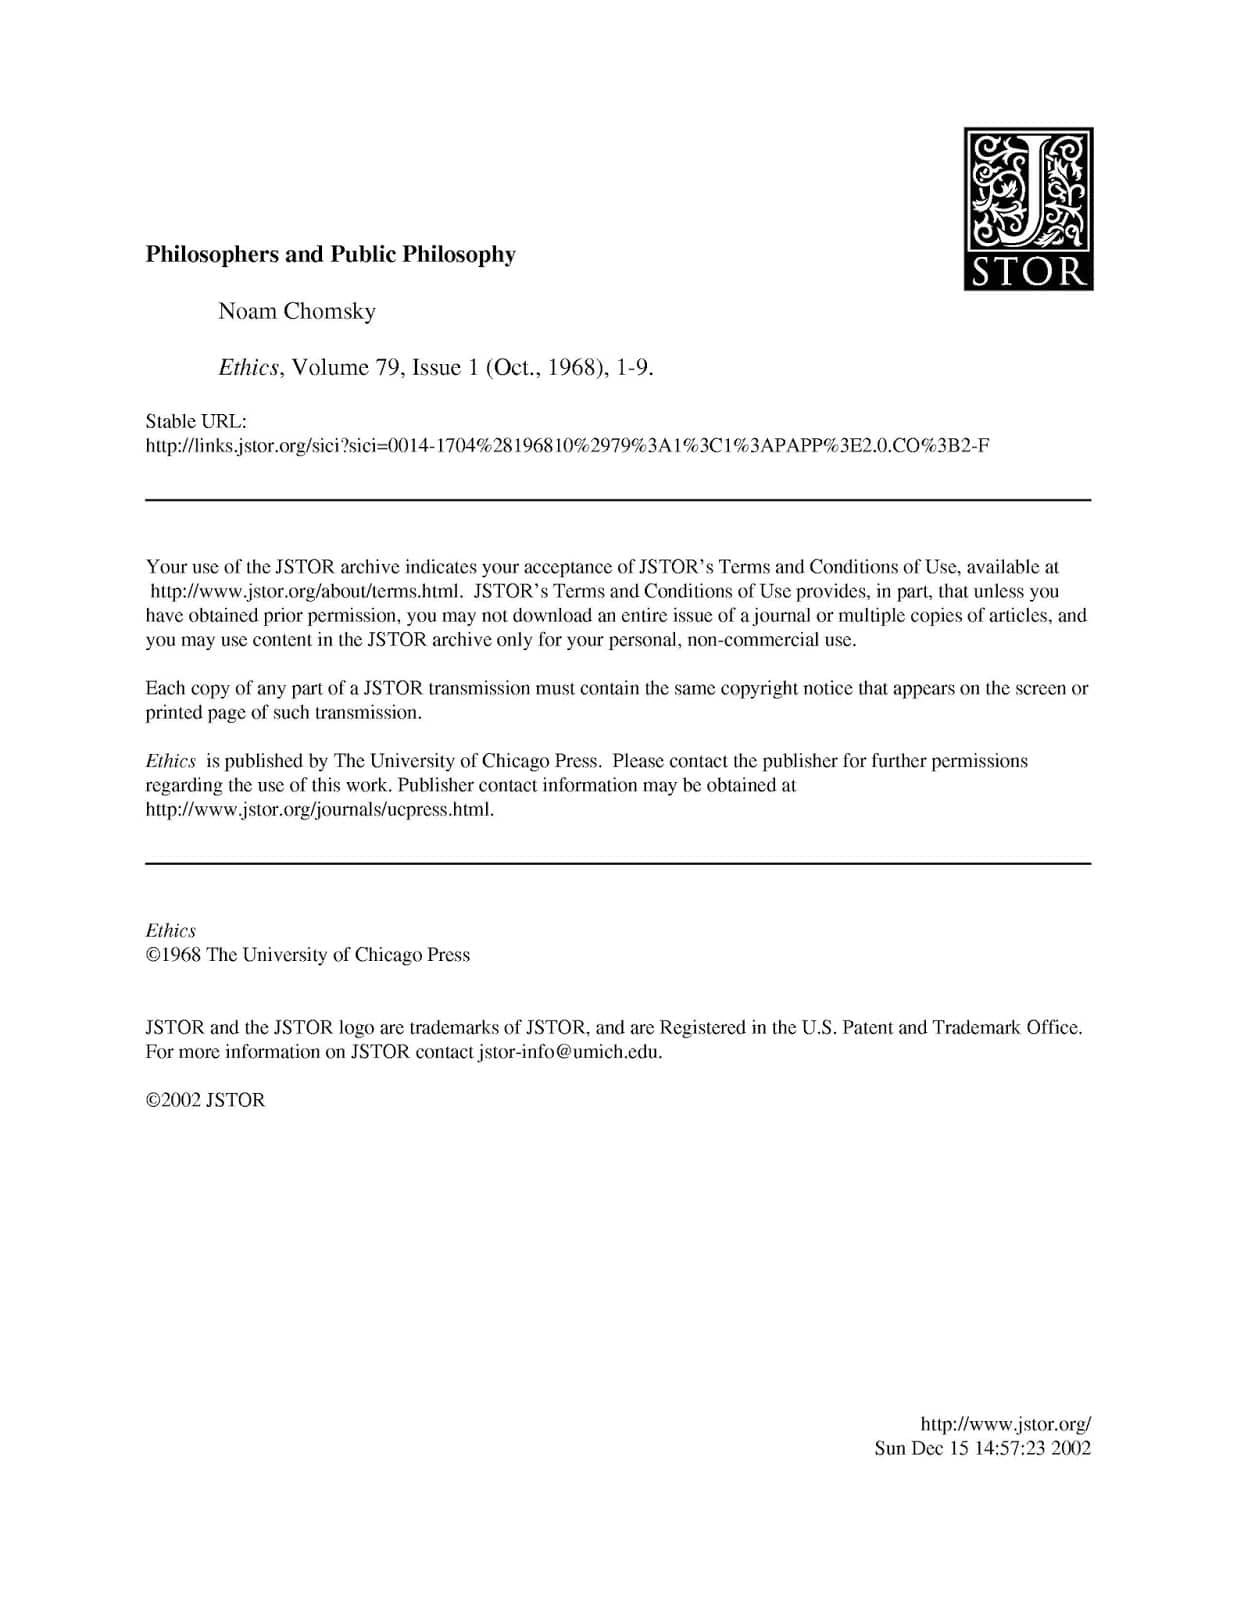 Philosophers And Public Philosophy